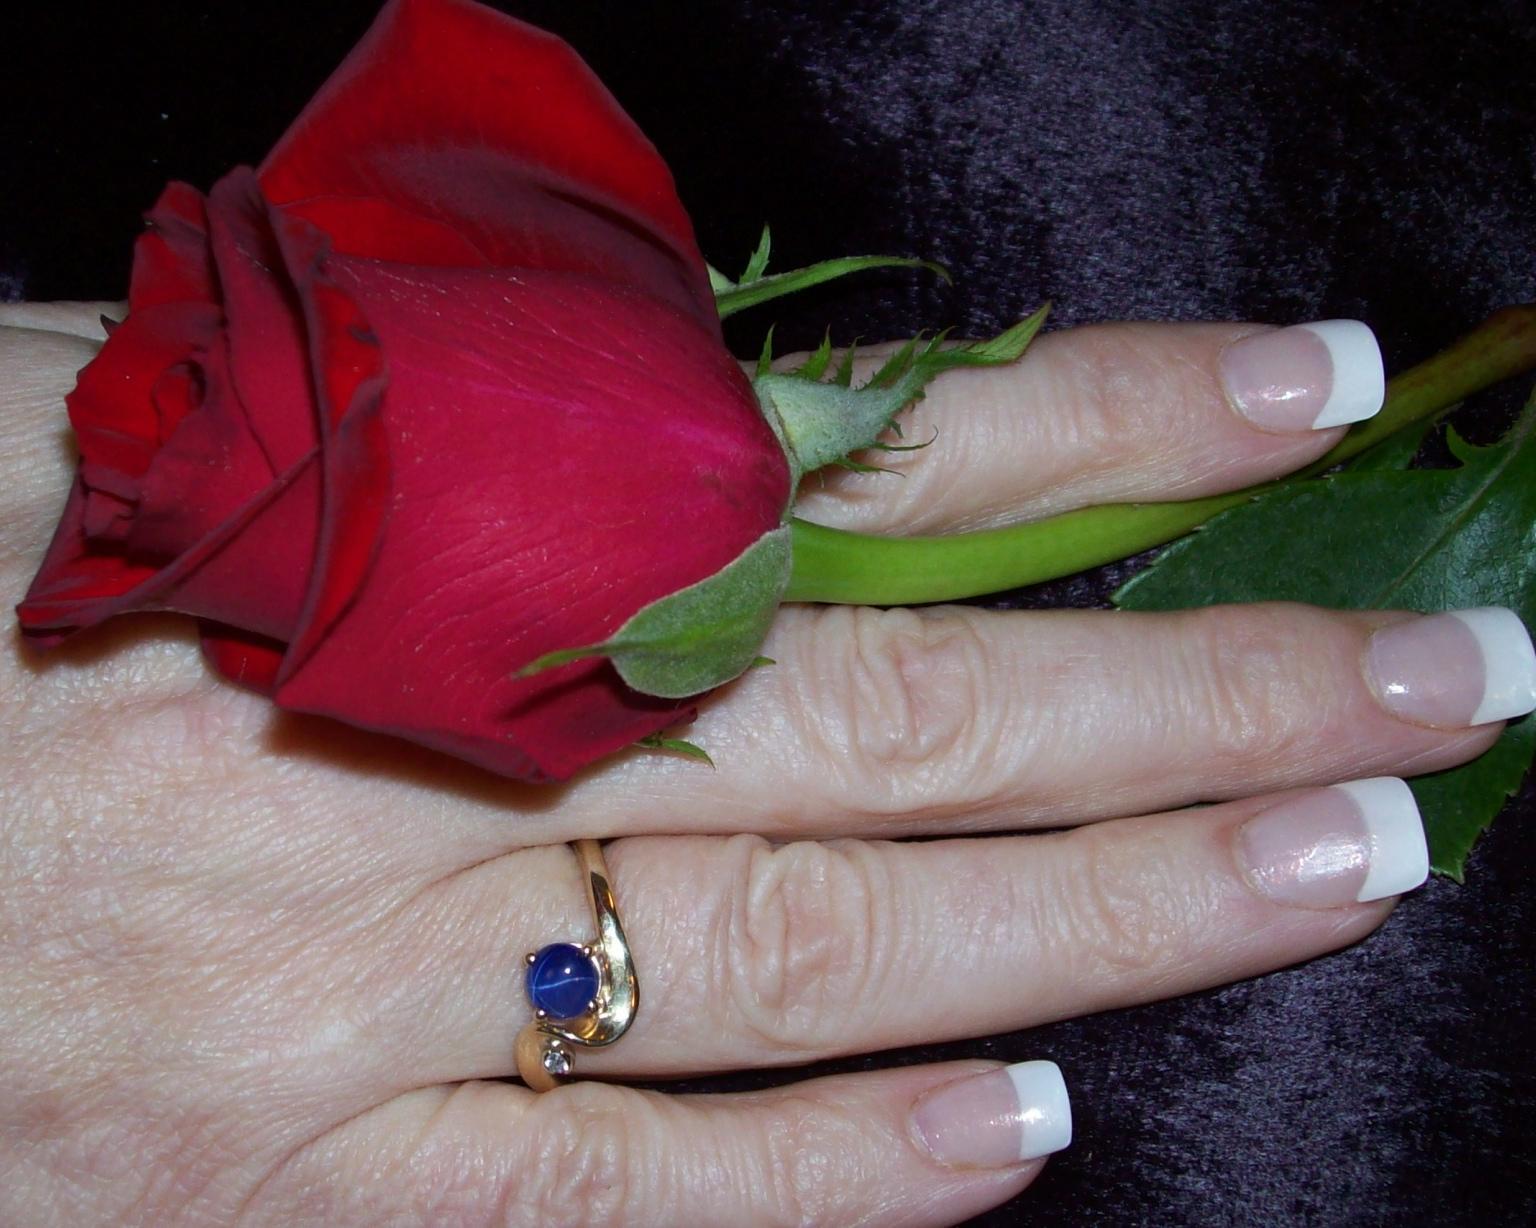 The wedding ring will nest